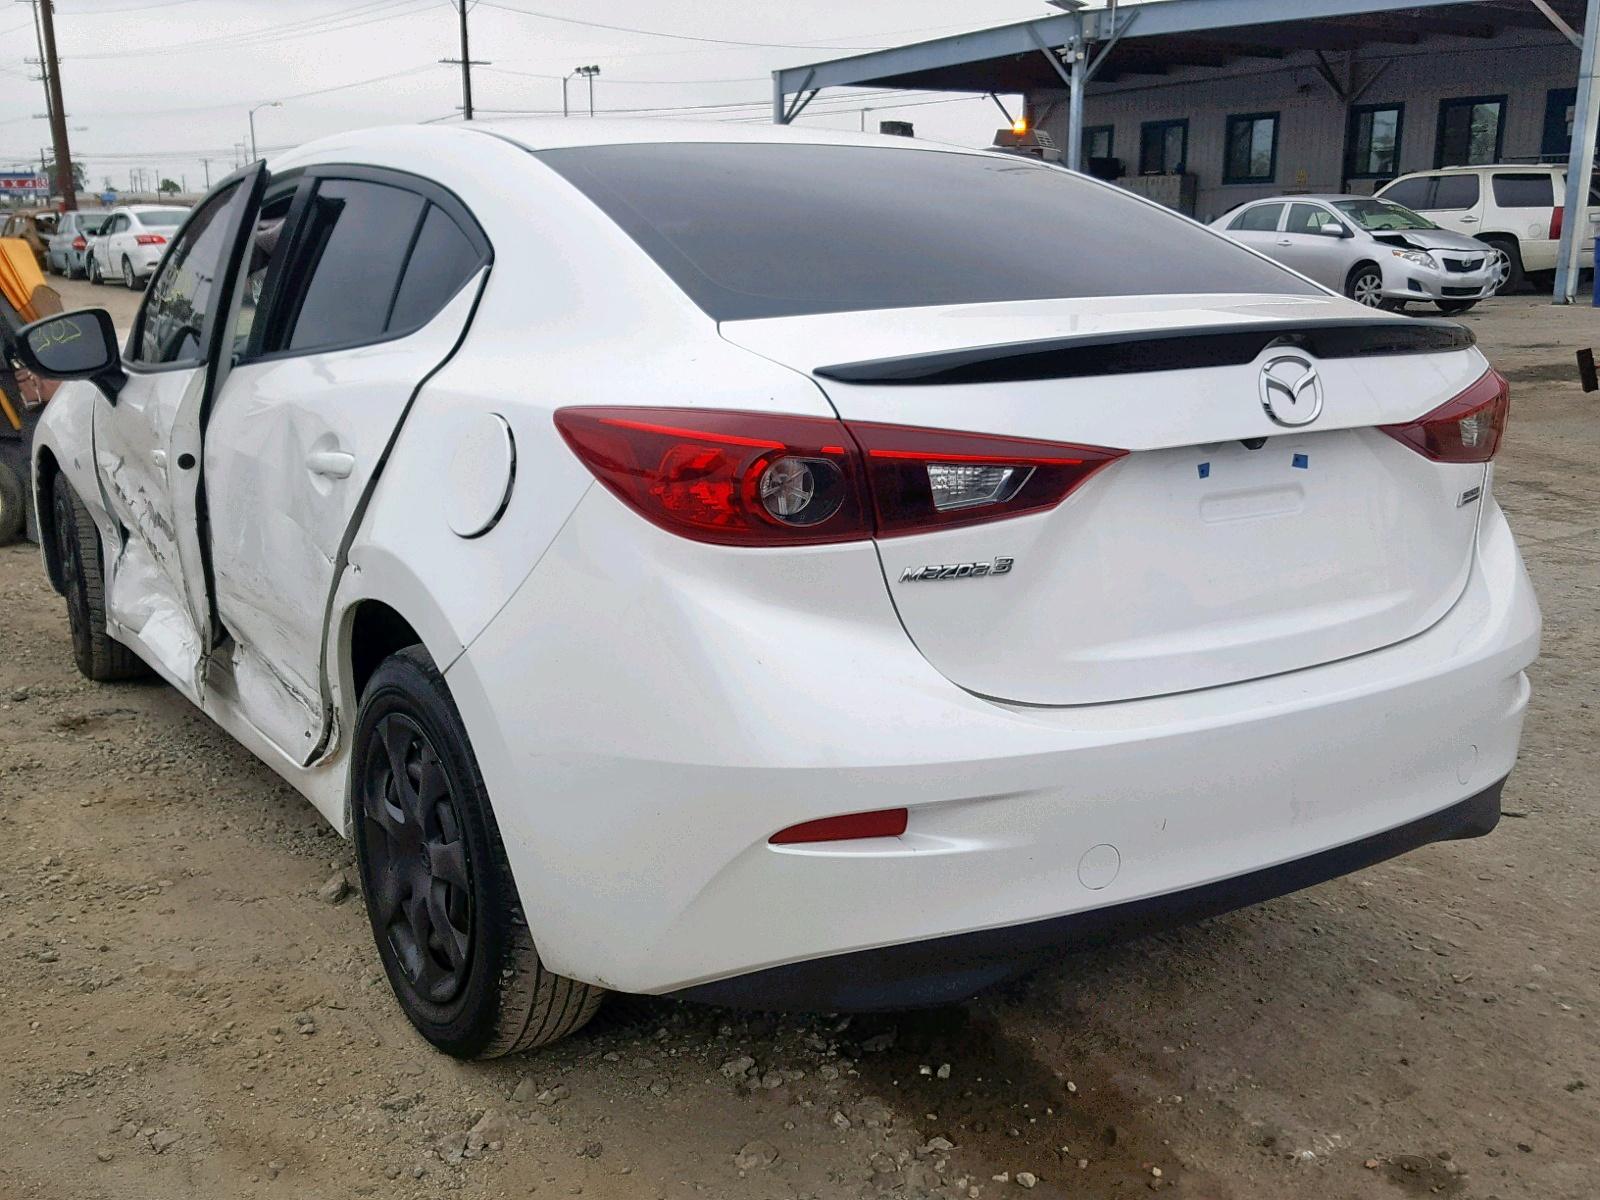 3MZBN1U79HM154459 - 2017 Mazda 3 Sport 2.0L [Angle] View